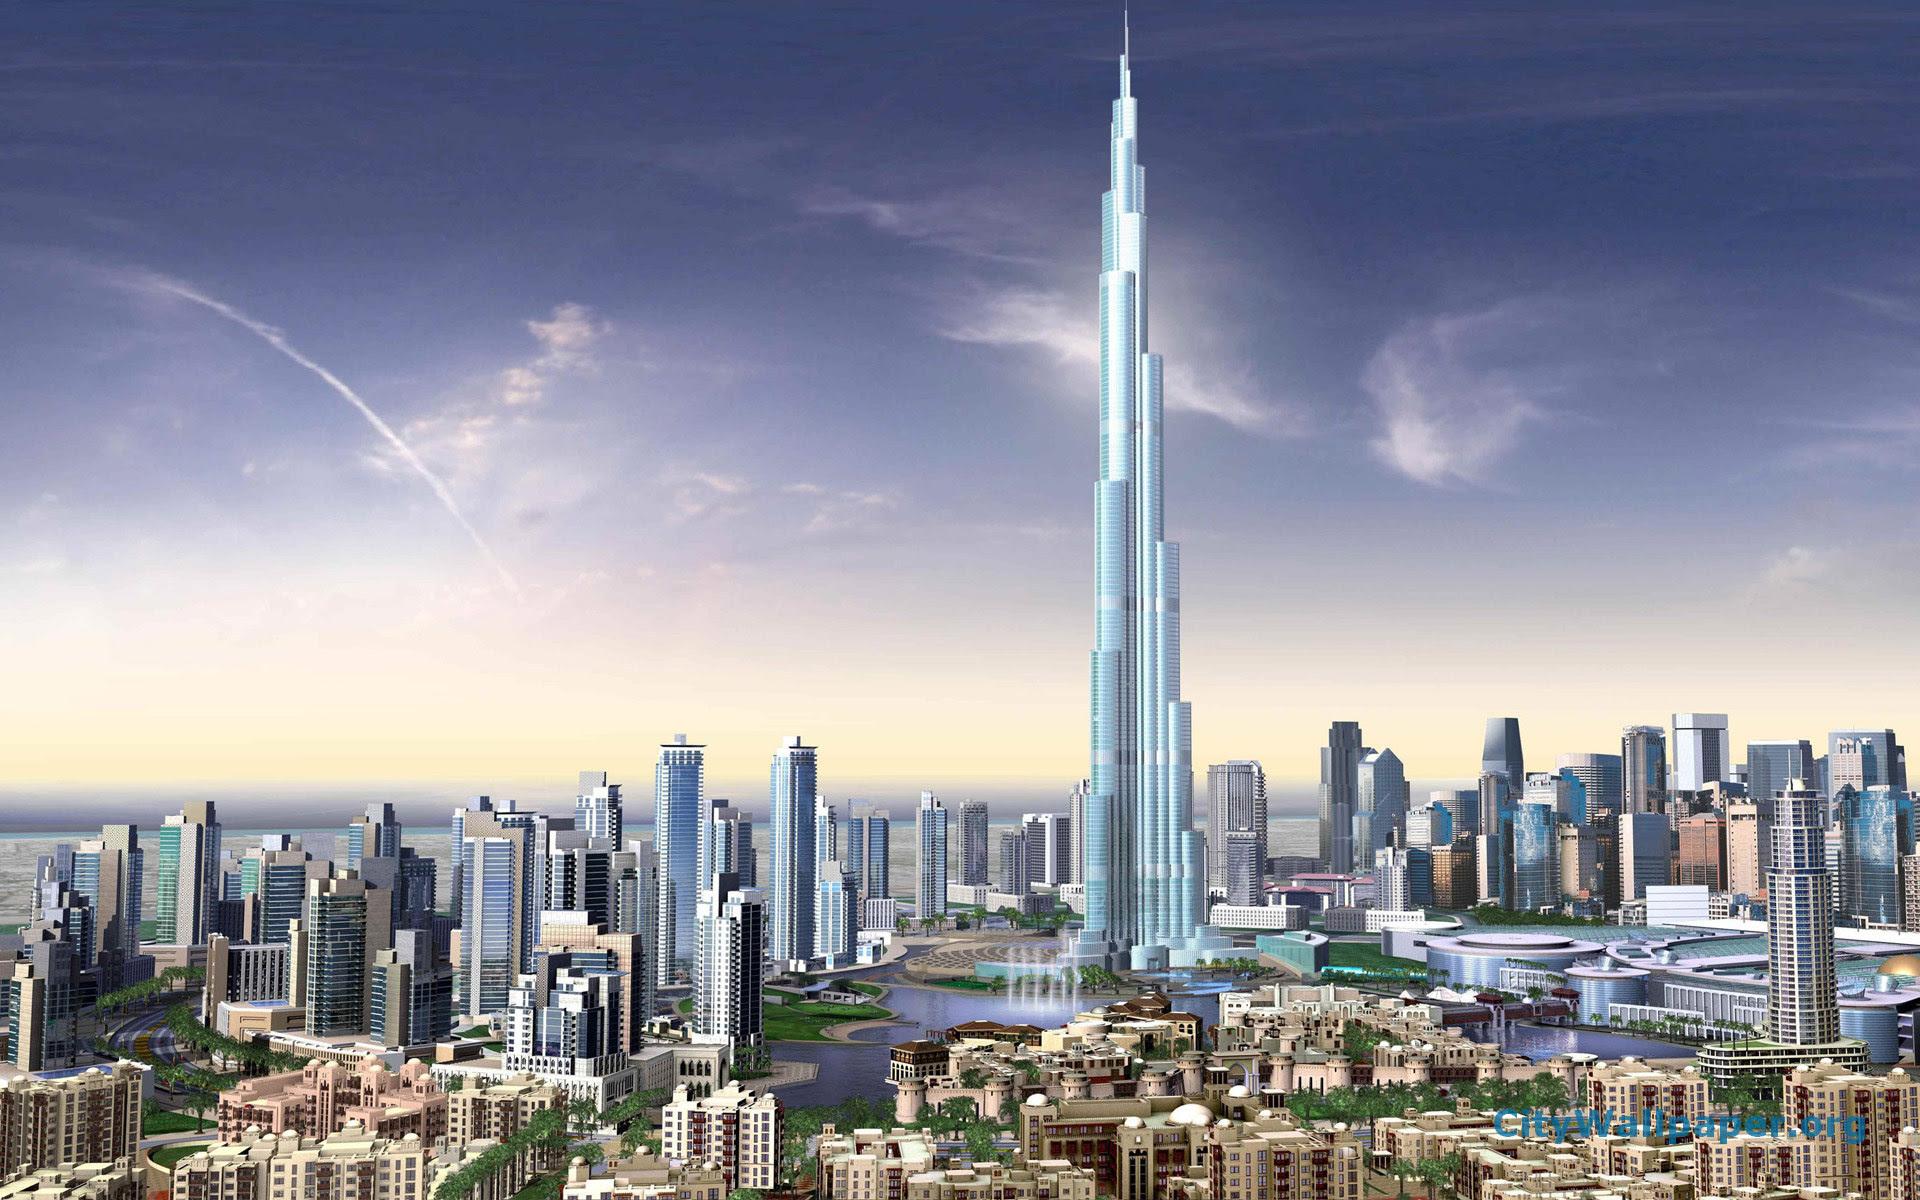 The 9 Most Beautiful Burj Khalifa Dubai burj khalifa dubai uae, burj khalifa dubai tickets, burj khalifa dubai hotel, burj khalifa dubai mall, burj khalifa dubai facts, burj khalifa dubai tennis court, burj khalifa dubai's vertical city, burj khalifa dubai images, burj khalifa dubai video, burj khalifa dubai uae 828m, burj khalifa downtown dubai uae, burj khalifa tower dubai uae, biggest building burj khalifa dubai uae, nandos burj khalifa dubai - united arab emirates, burj khalifa lake fountains in dubai uae, burj khalifa dubai hotel rates, burj khalifa dubai hotel prices, burj khalifa dubai hotel booking, burj khalifa dubai hotel armani, burj khalifa hotel dubai jobs, burj khalifa hotel dubai wiki, burj khalifa hotel dubai video, burj khalifa palace hotel dubai, burj khalifa dubai mall metro station, burj khalifa dubai mall aquarium, burj khalifa dubai mall fountain, burj khalifa dubai mall waqar, burj khalifa dubai mall map, burj khalifa dubai mall station, burj khalifa dubai mall tickets, burj khalifa near dubai mall, burj khalifa to dubai mall distance, burj khalifa dubai images download, burj khalifa dubai pic, burj khalifa dubai photos hd, burj khalifa dubai hd images, burj khalifa tower dubai image, burj khalifa dubai photo gallery, burj khalifa tower dubai photos, burj al khalifa dubai pictures, burj khalifa dubai interior pictures